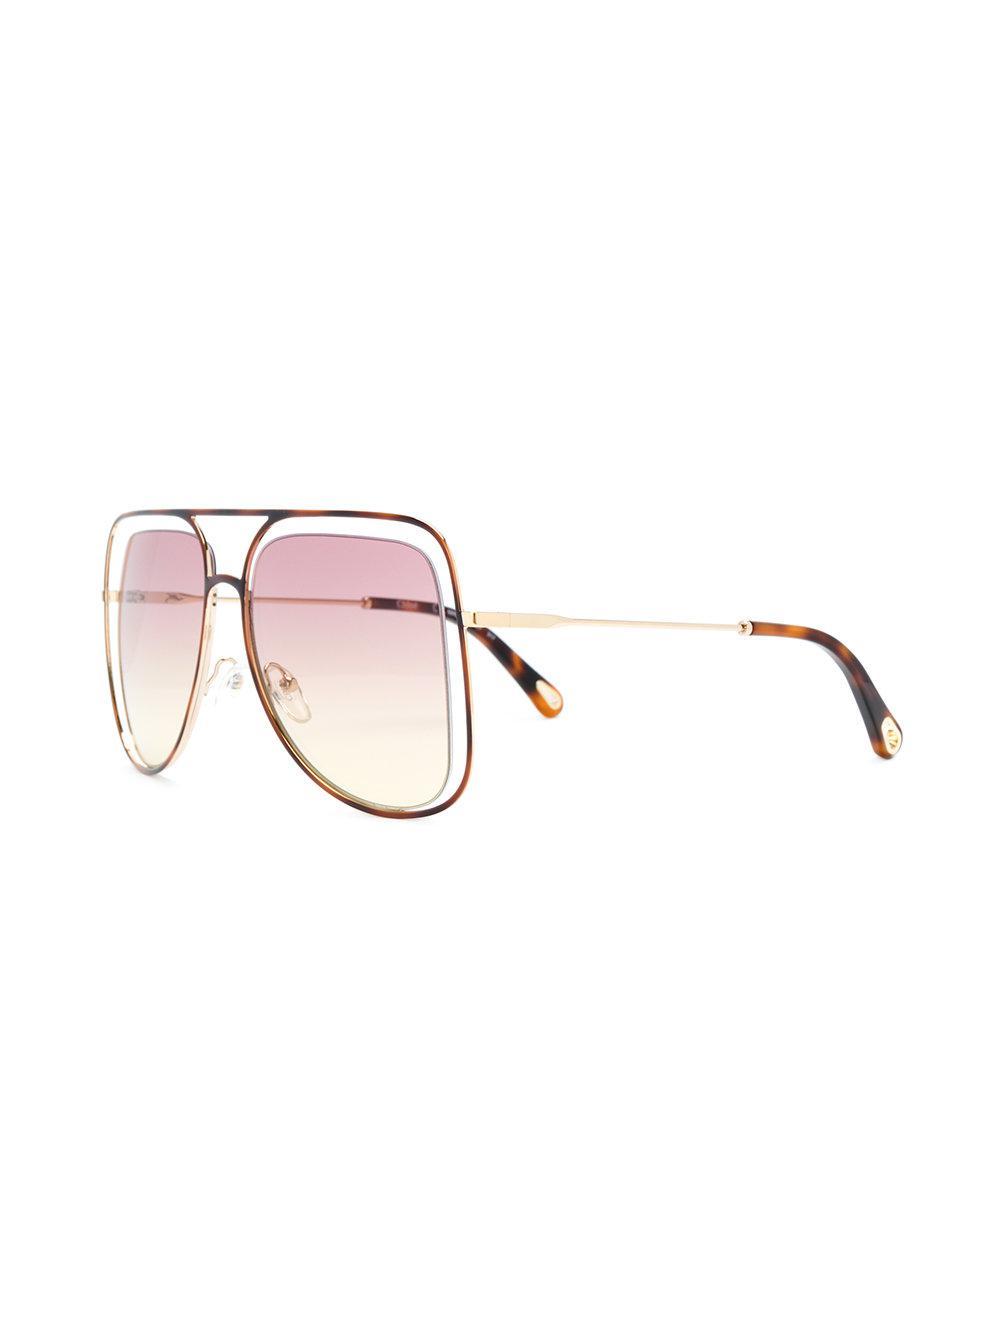 89804b56f7a Chloé Floating Frame Sunglasses in Metallic - Lyst